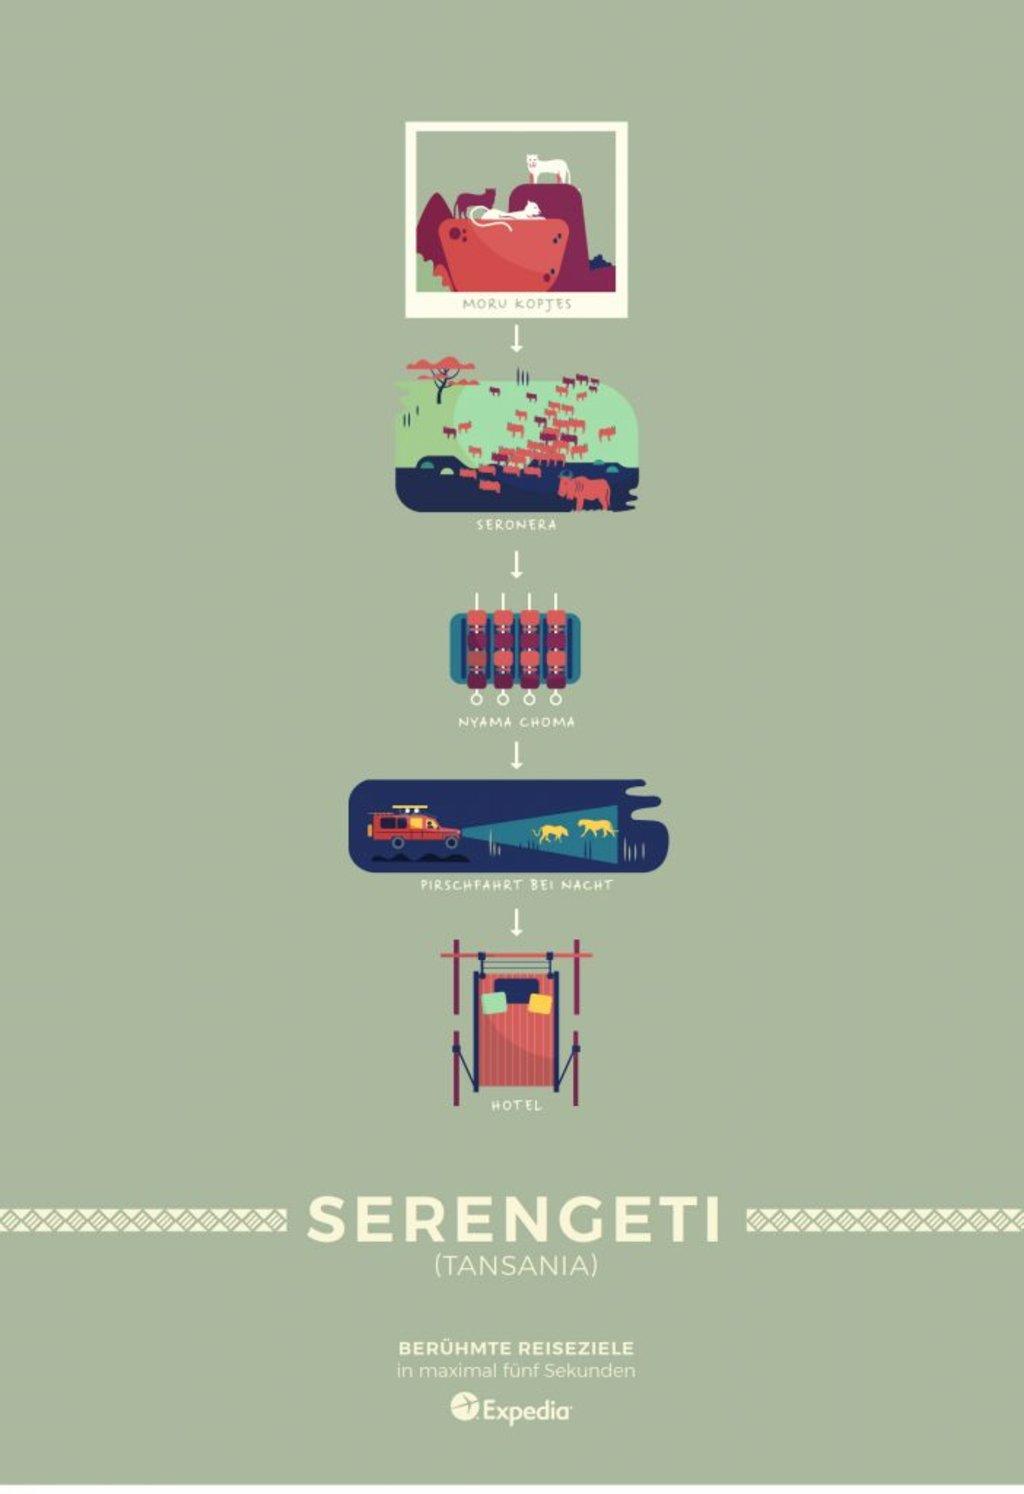 Reiseziele in 5 Sekunden: Serengeti